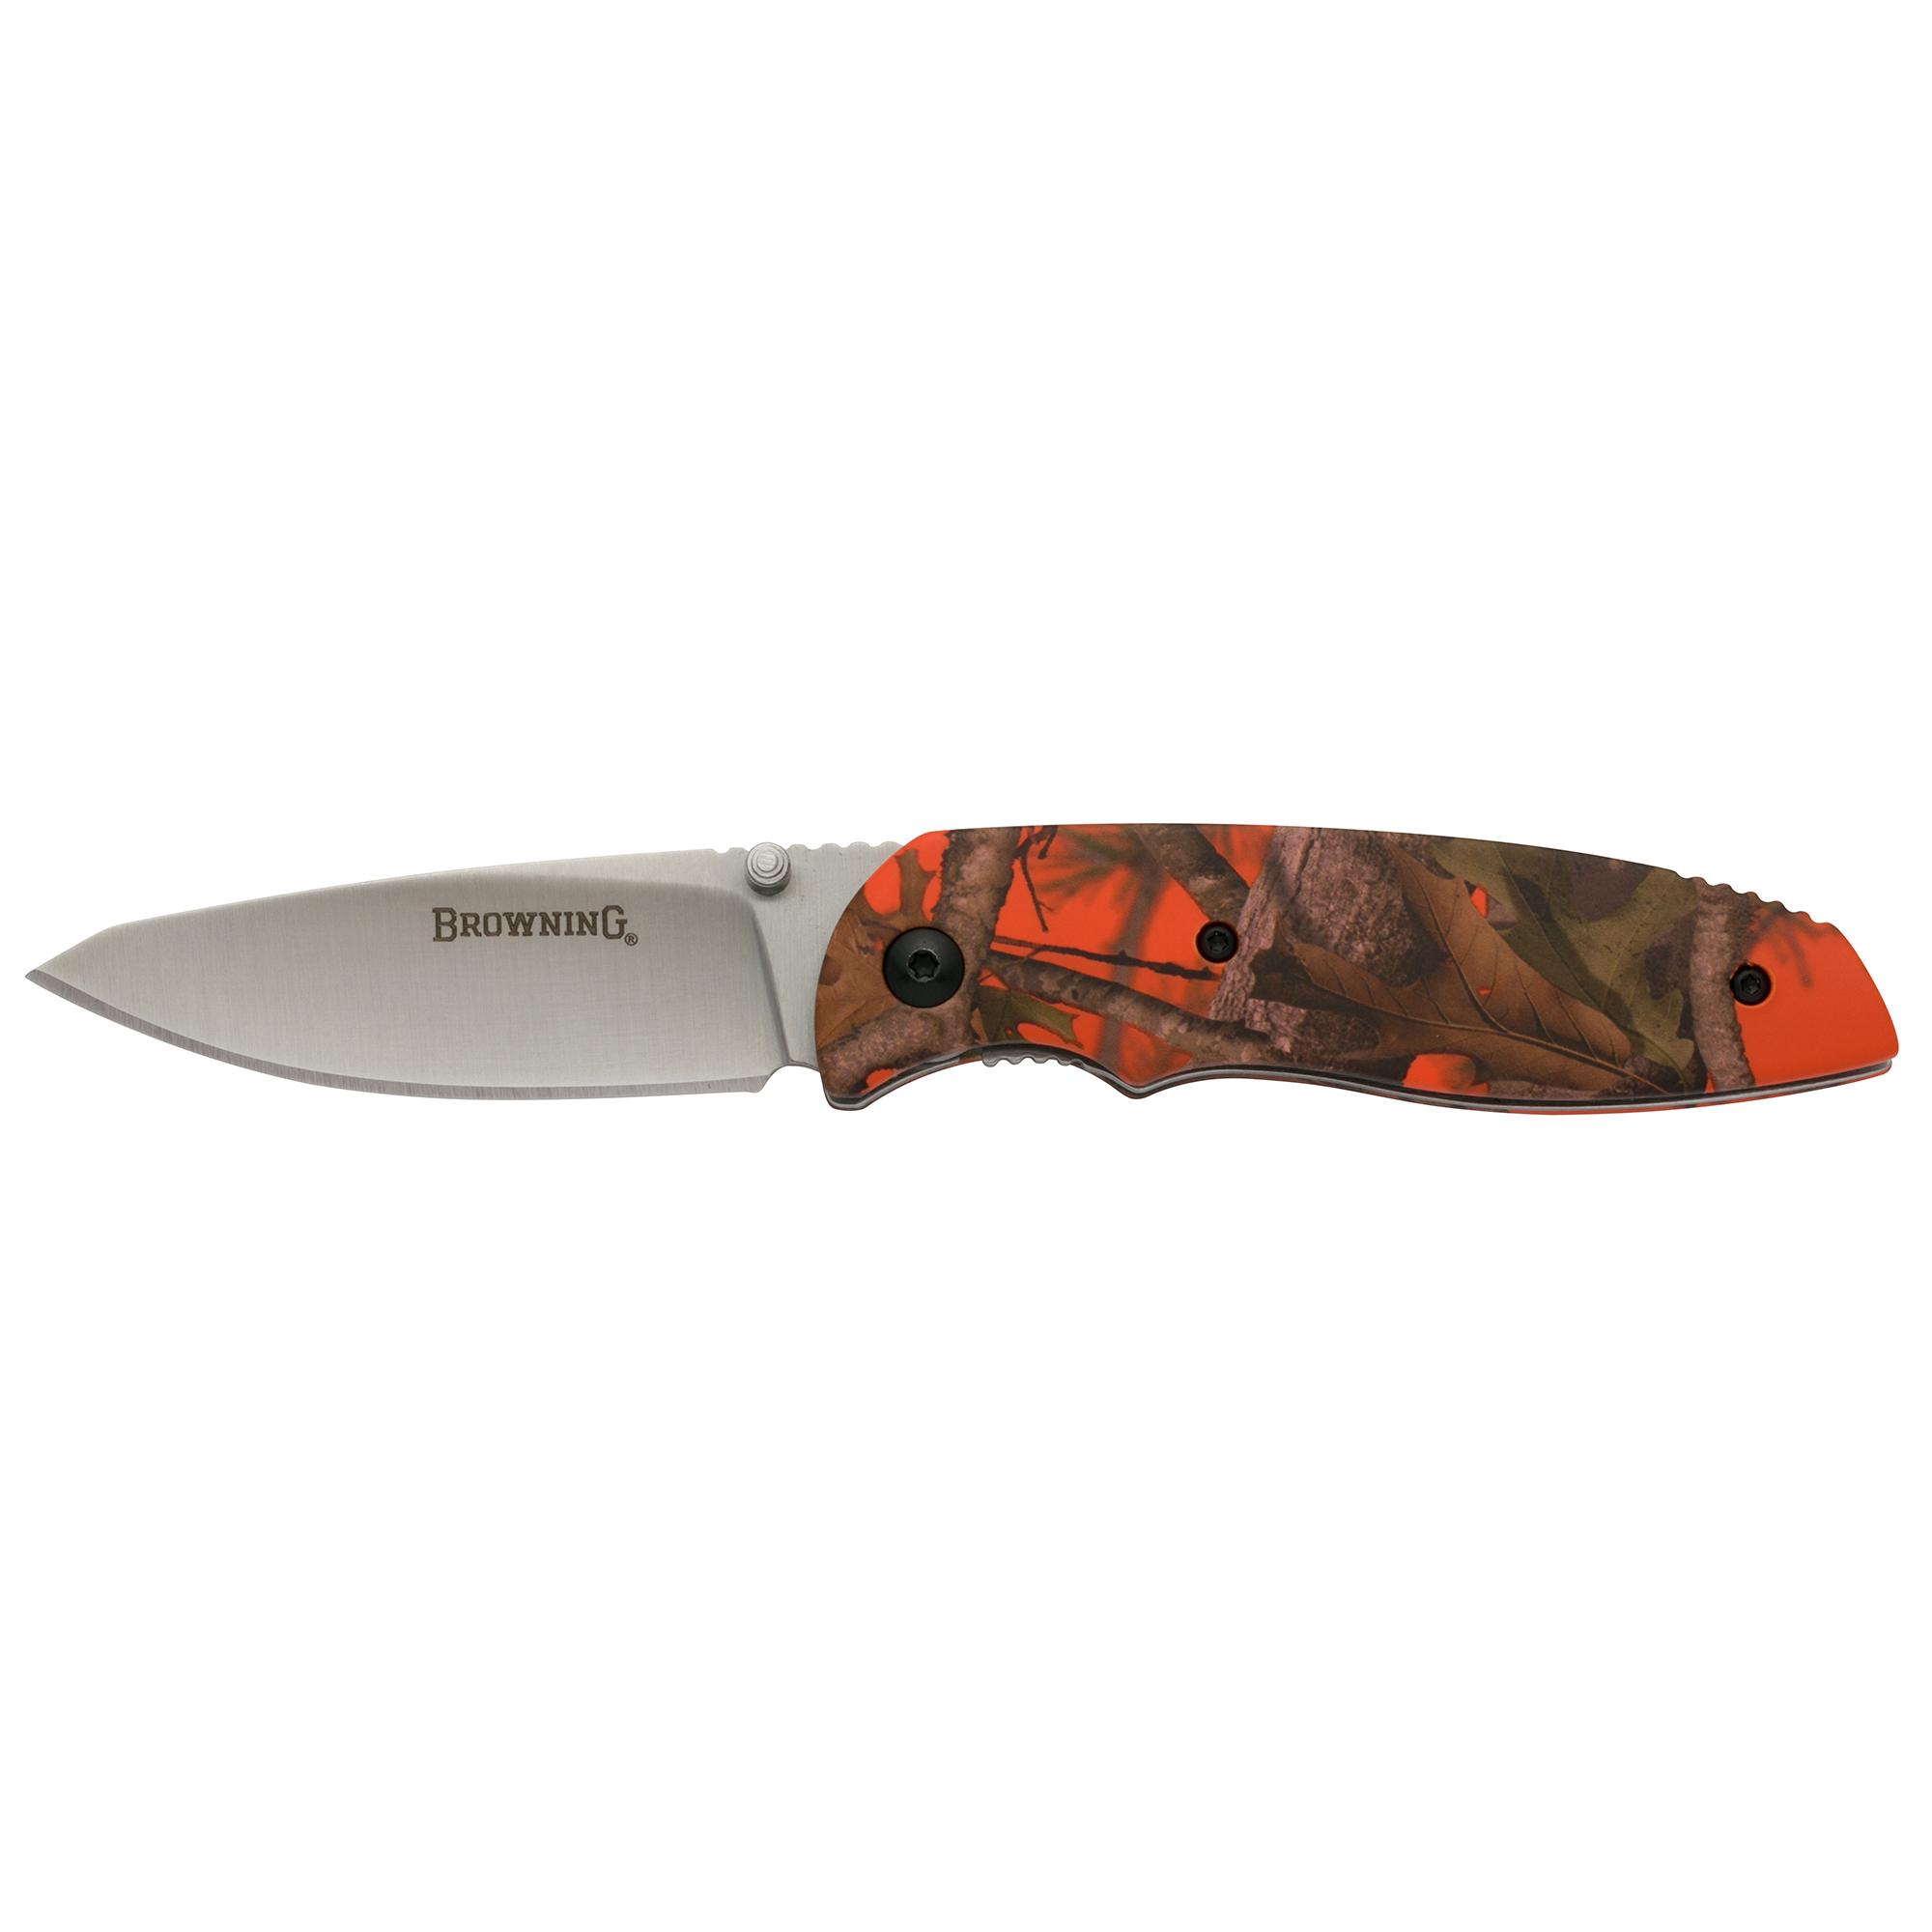 Browning EDC Folder Folding Knife, Blaze Camo